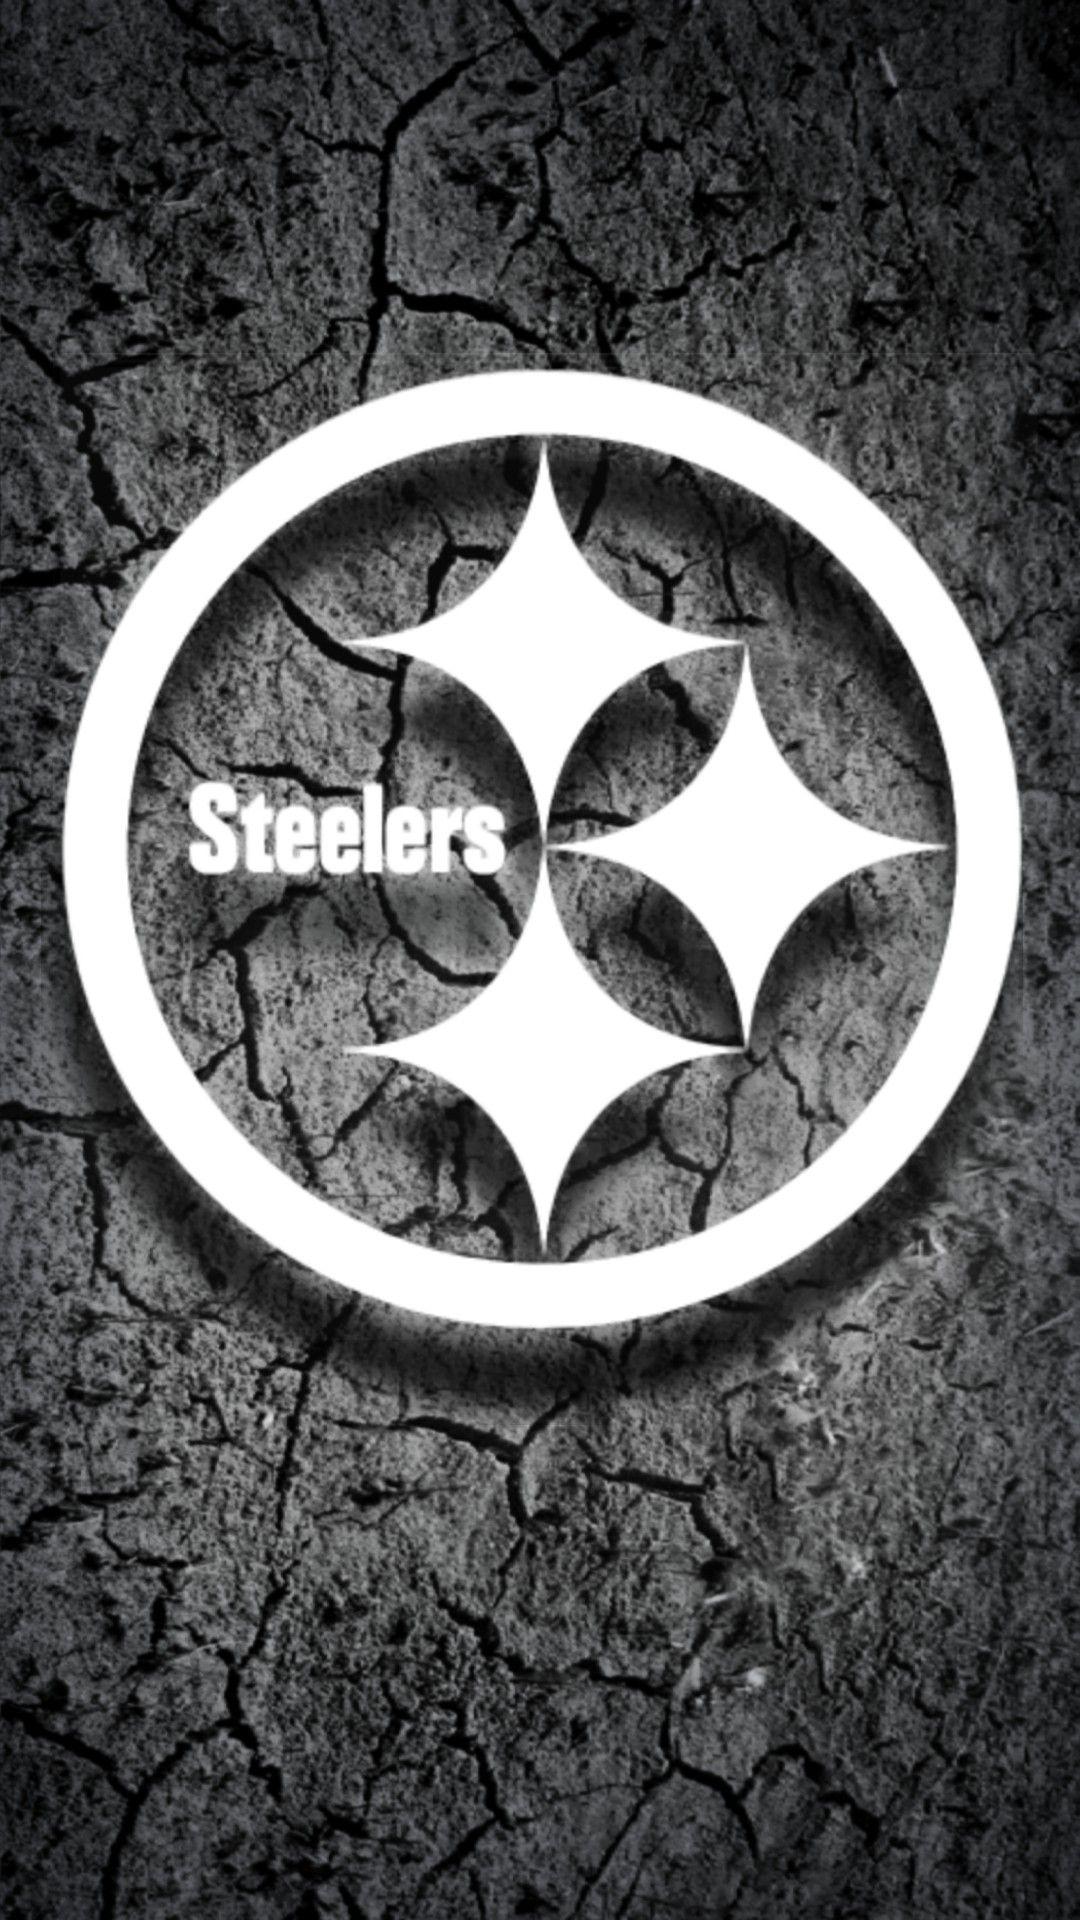 Pittsburgh Steelers Wallpaper Pittsburgh Steelers Wallpaper Pittsburgh Steelers Steelers